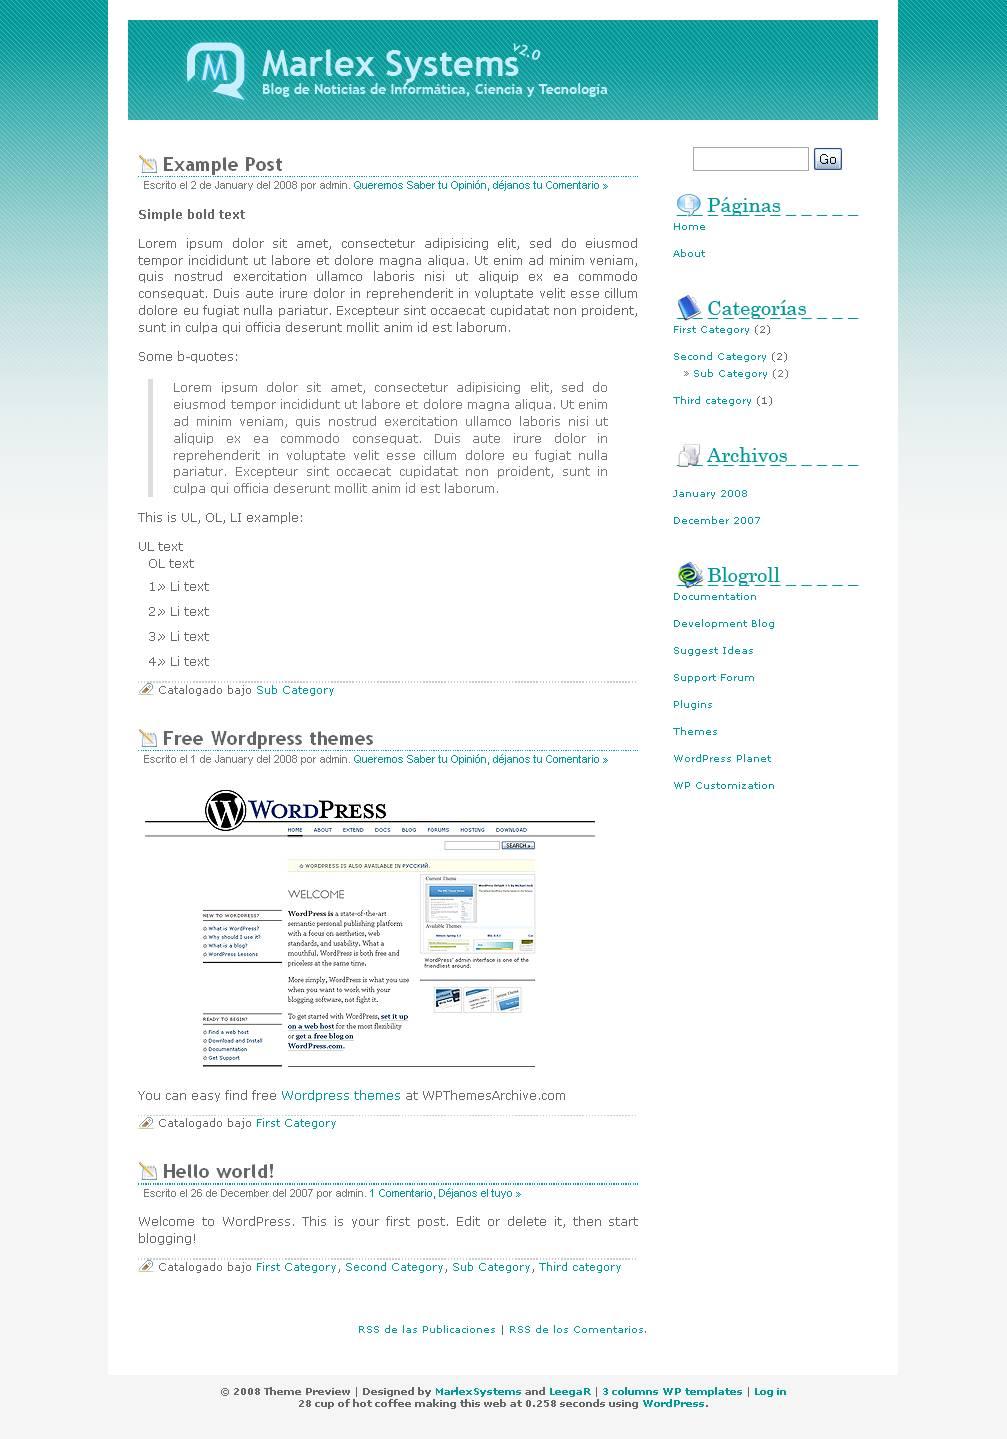 download MarlexSystems theme